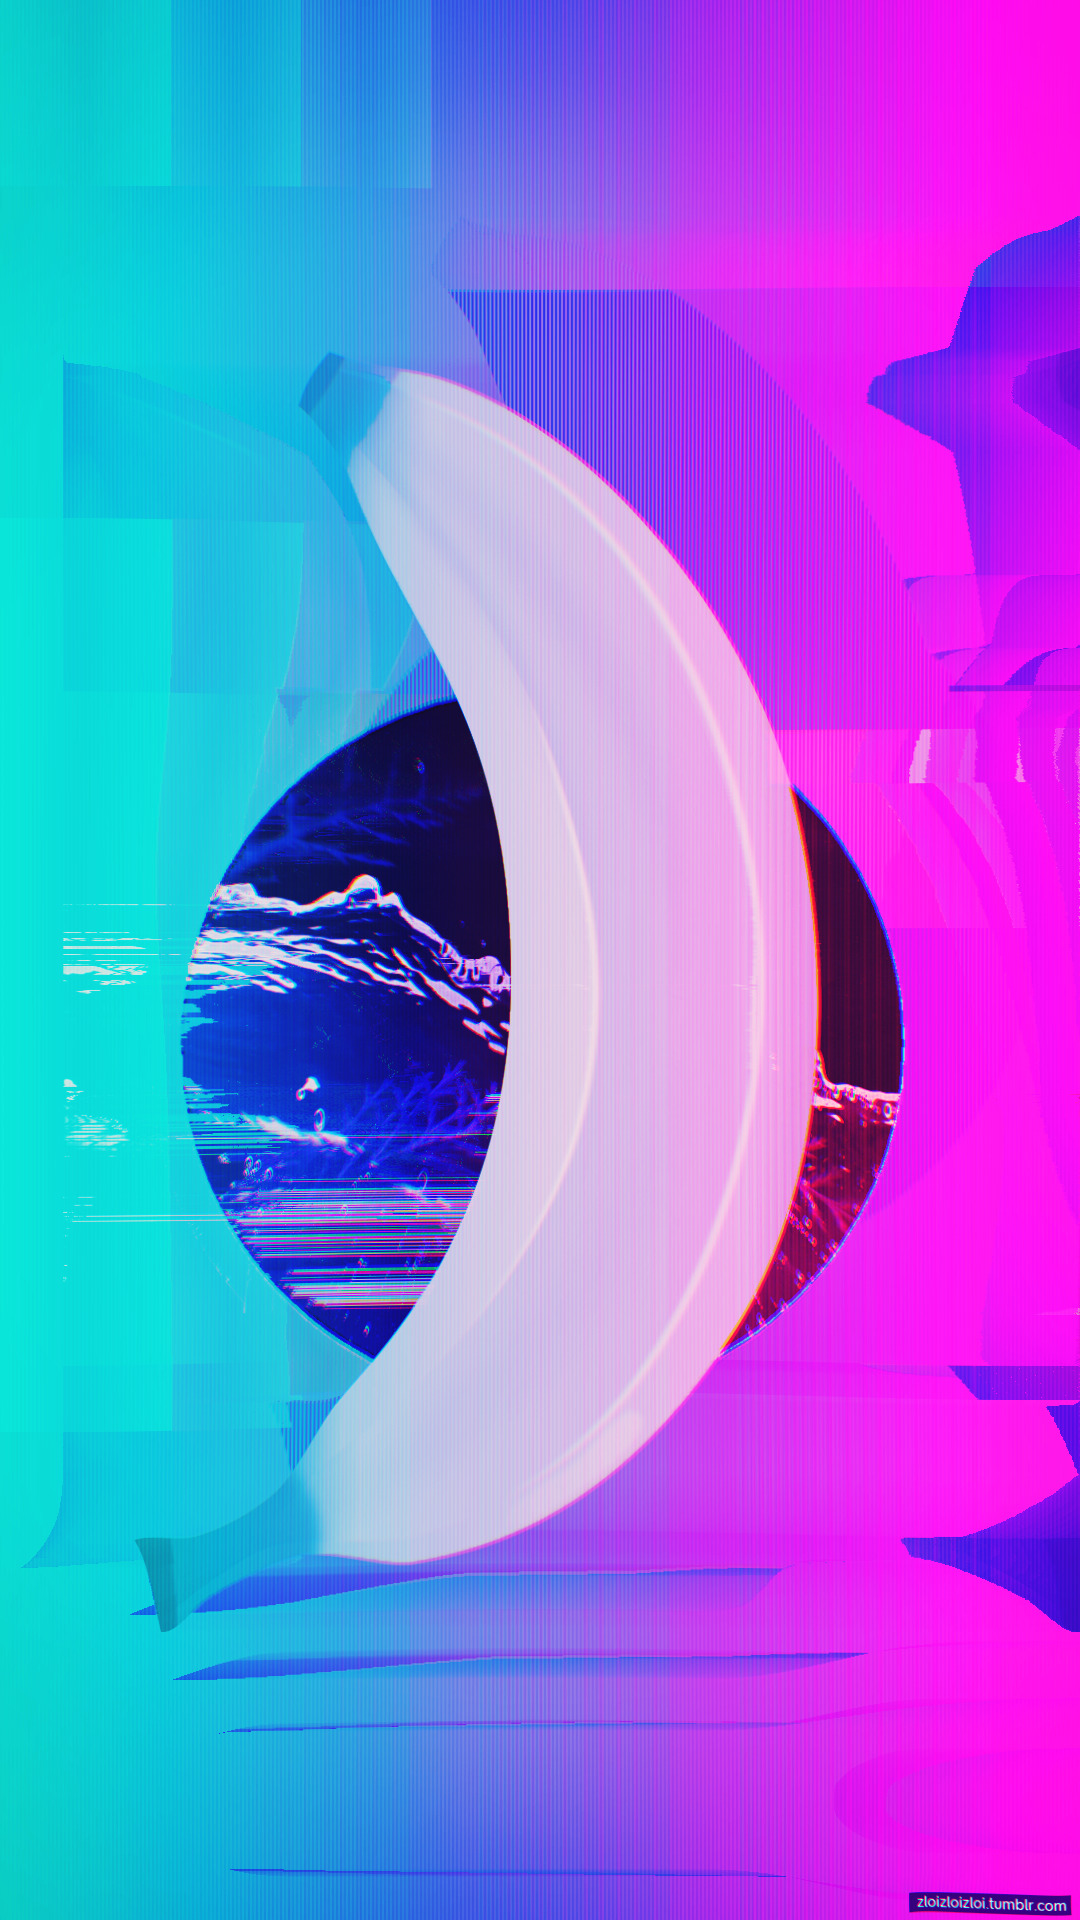 Hd Wallpapers Of Nail Art Glitch Art Webpunk Vaporwave Lsd Abstract Wallpapers